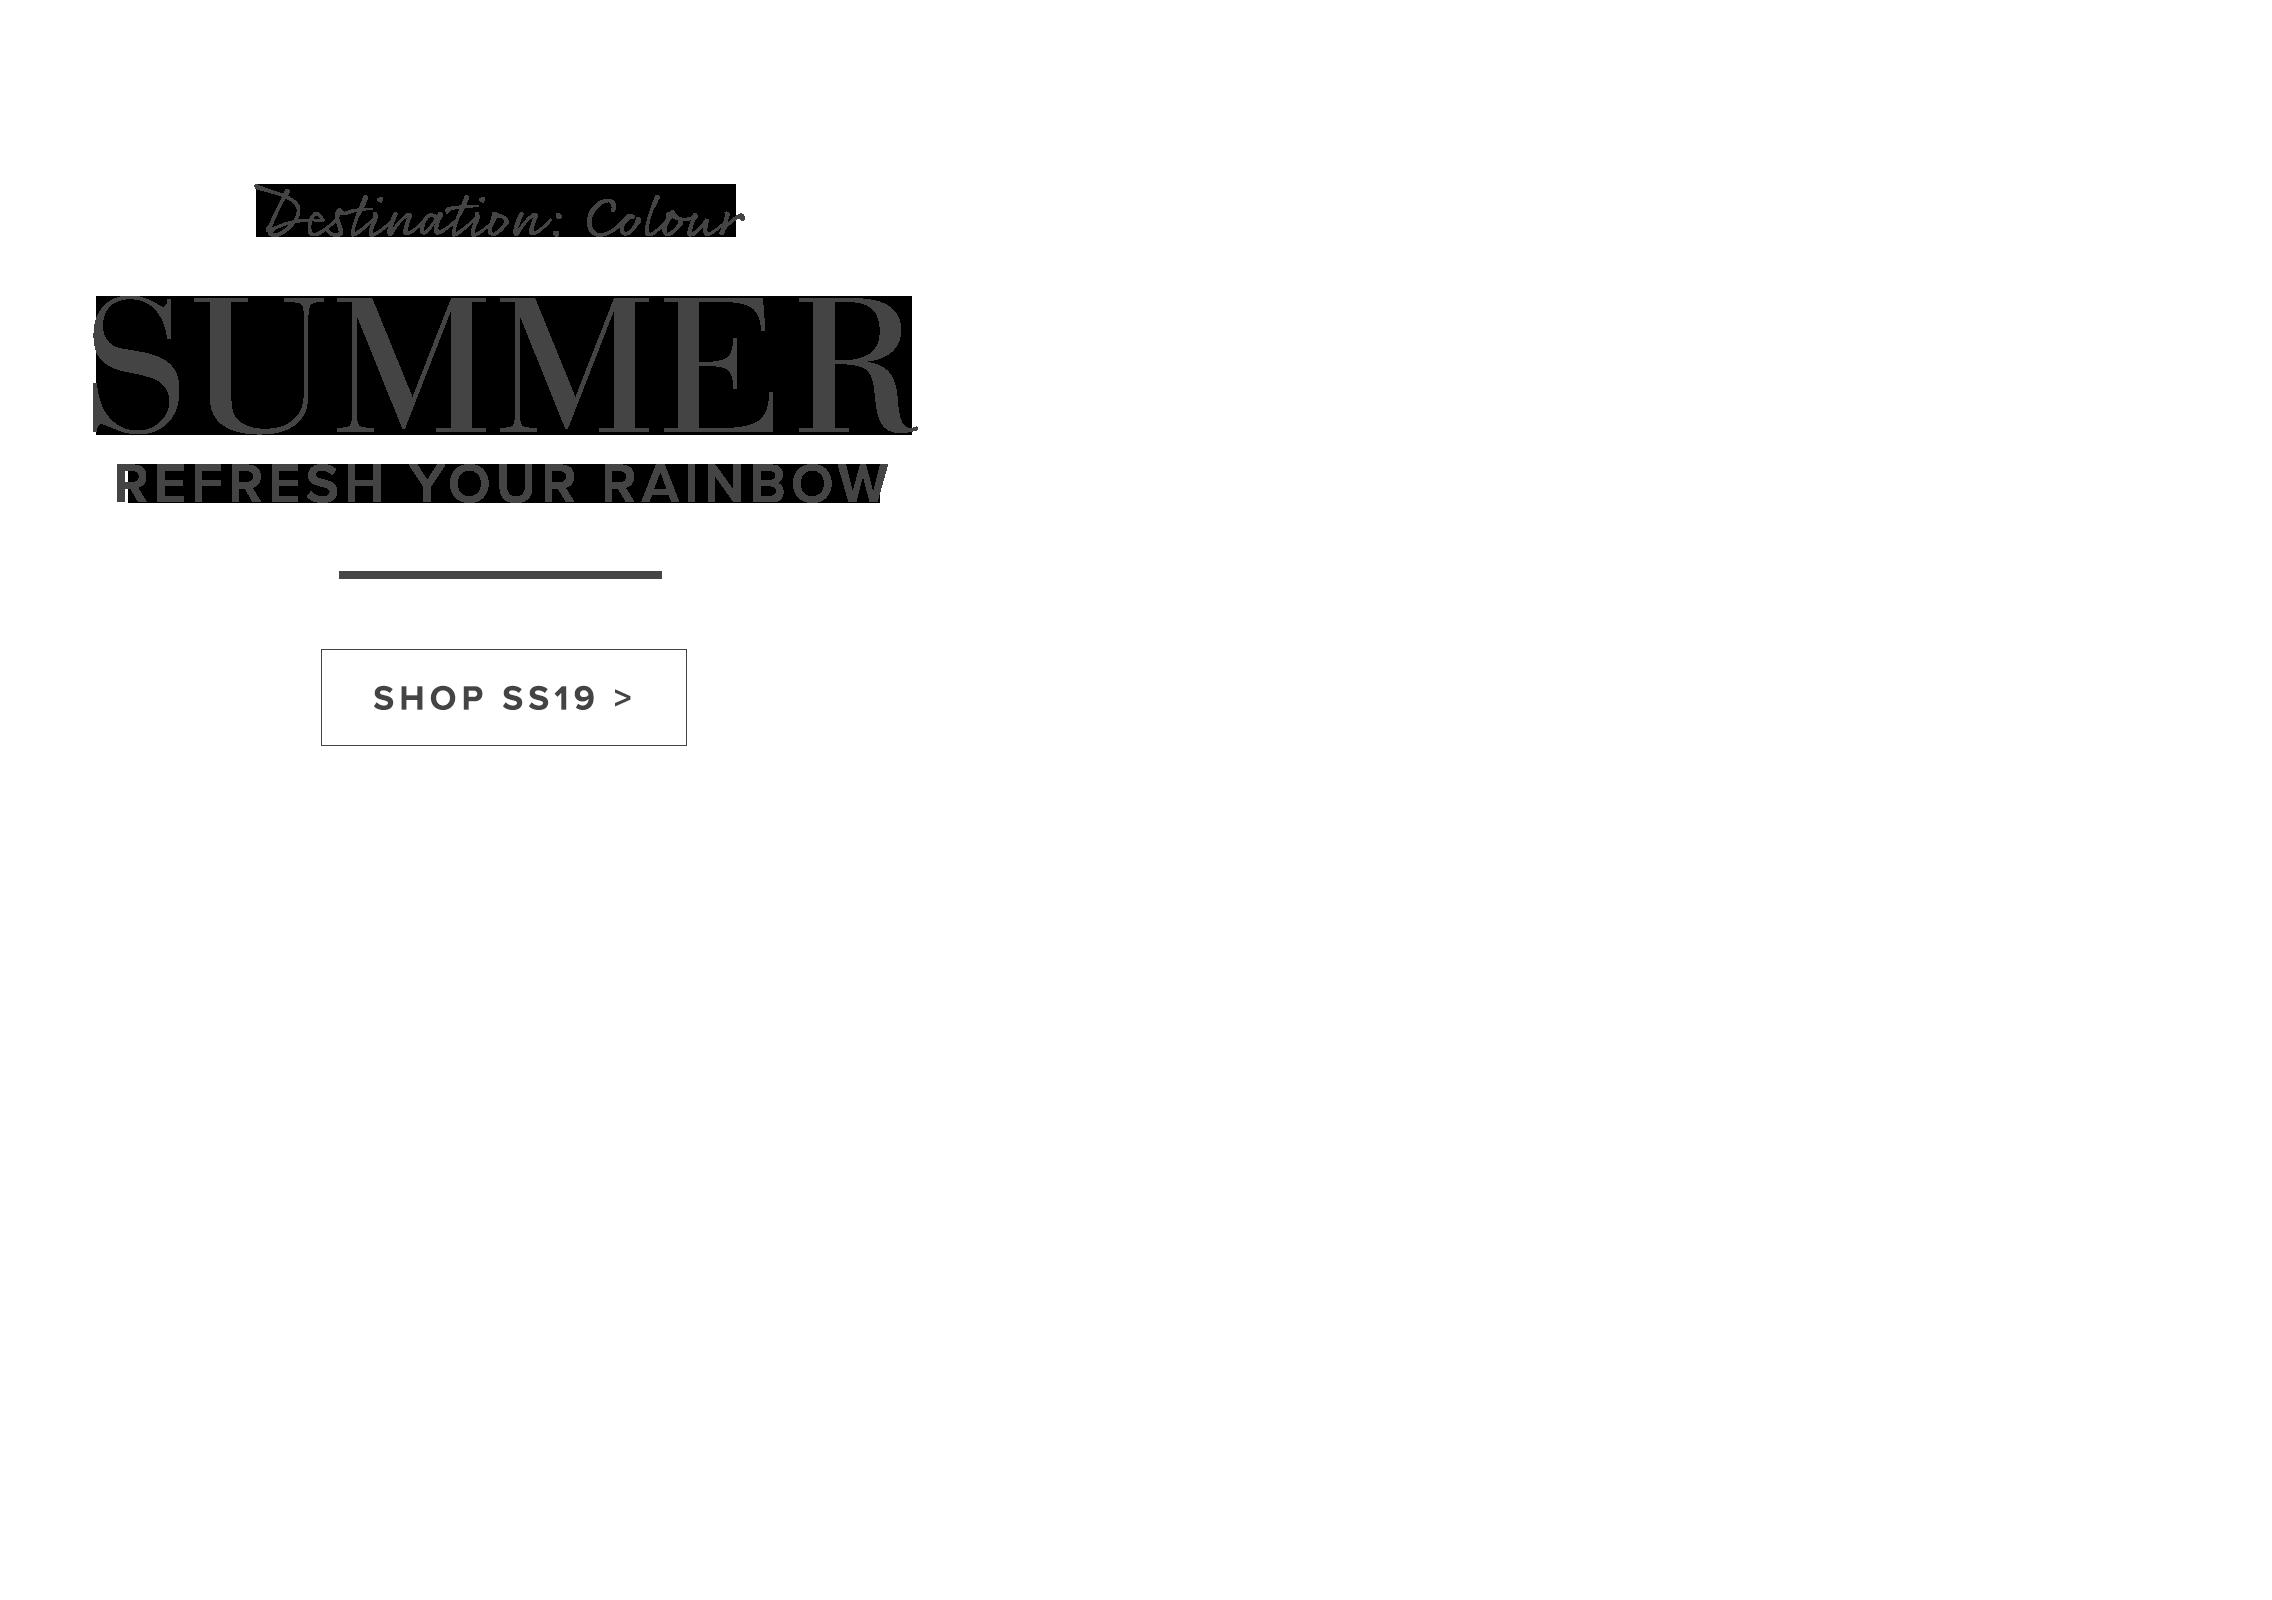 raw-main_overlay_ss19_summer_b.png